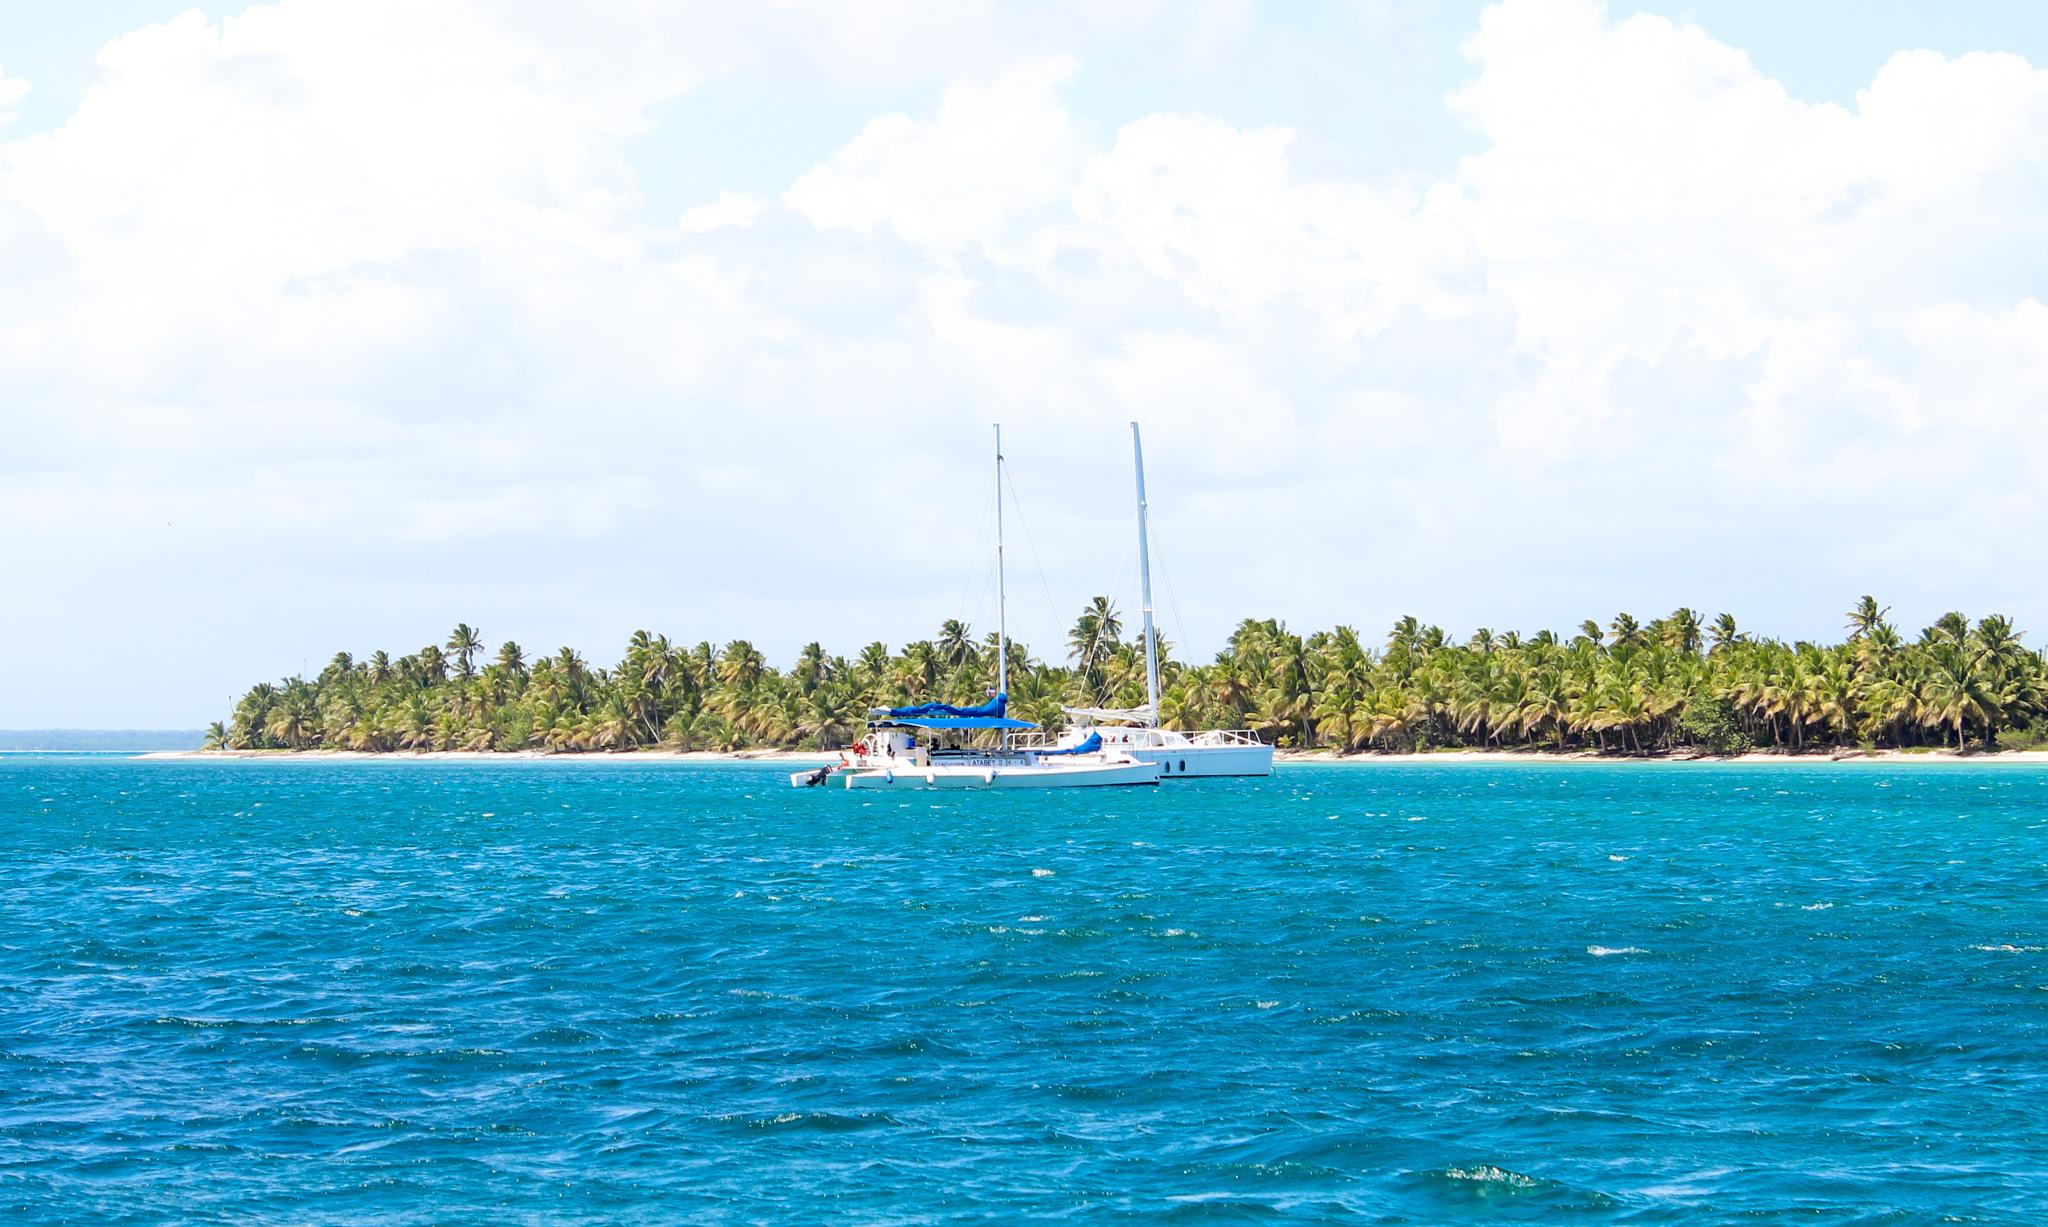 Catamarans in the Caribbean Sea